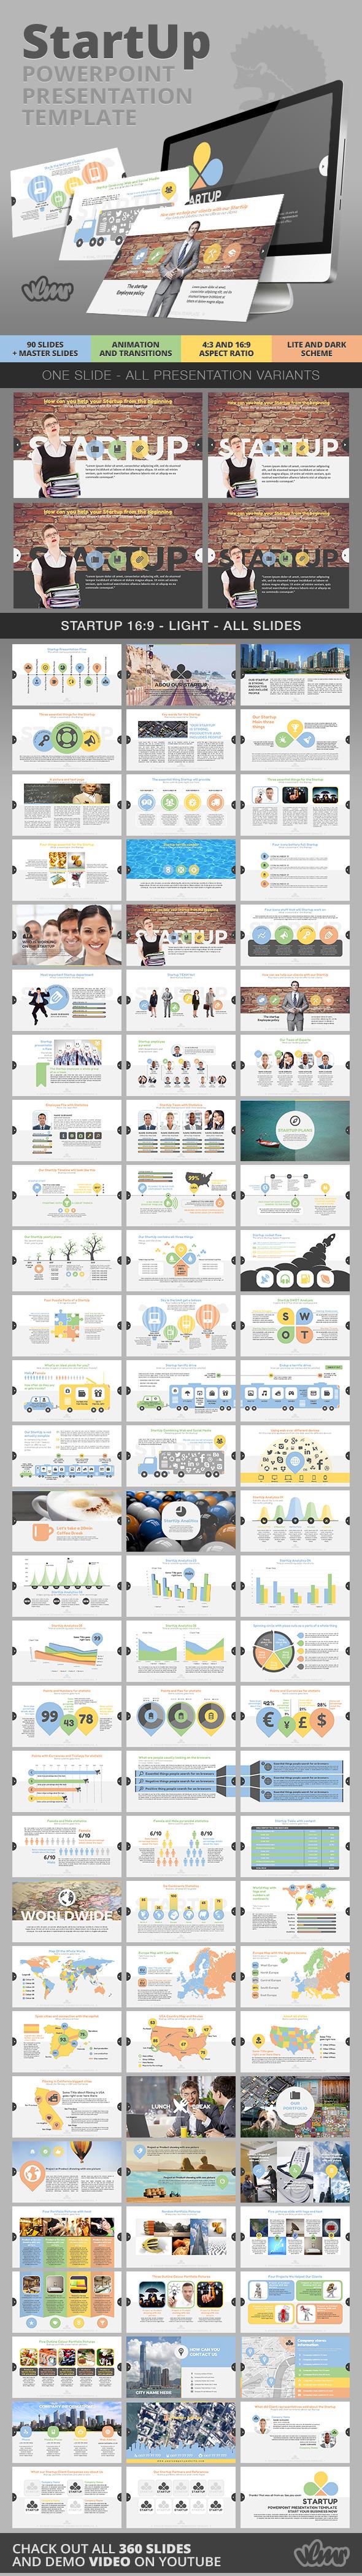 StartUp PowerPoint Presentation Template